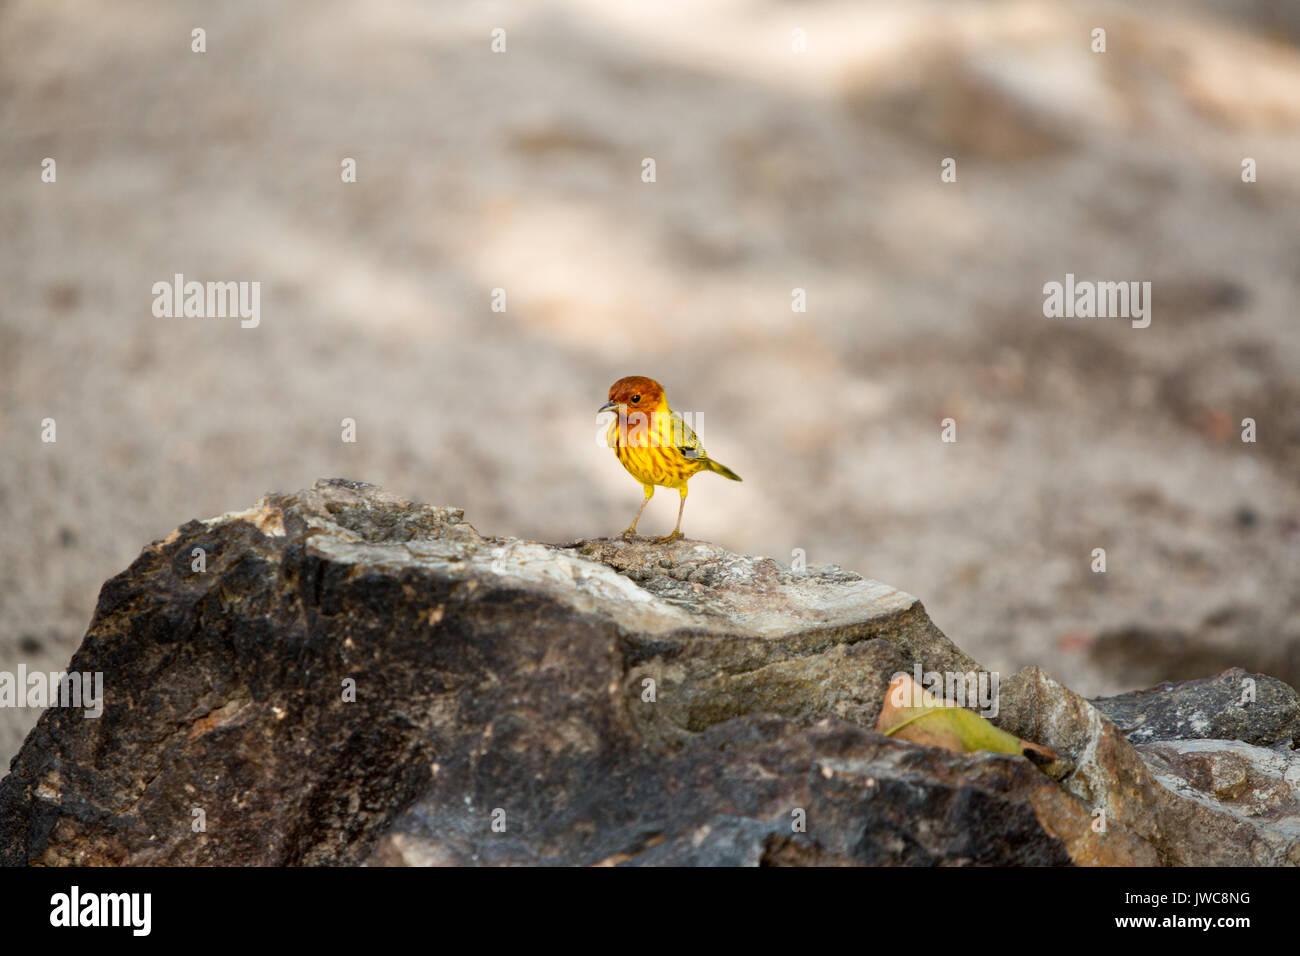 On Iguana Island,Isla Iguana,a mangrove warbler is perched atop a rock. - Stock Image